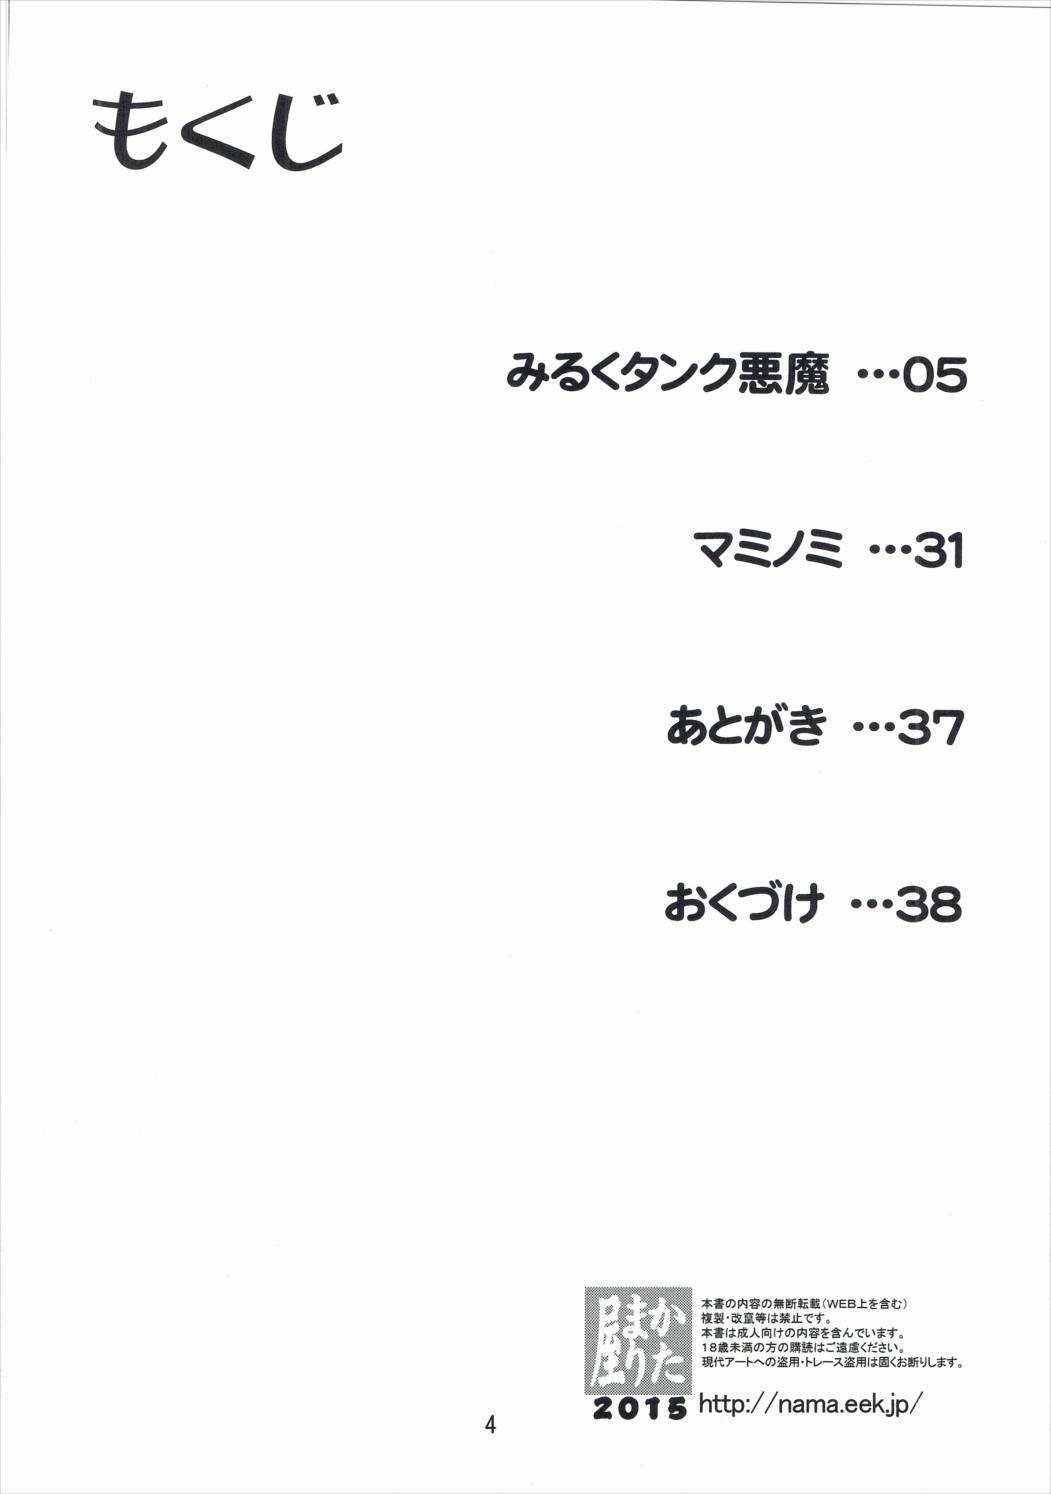 (C89) [KATAMARI-YA (Kanetsuki Masayoshi, Shinama) Noushuku! ! Homumilk (Puella Magi Madoka Magica) 2